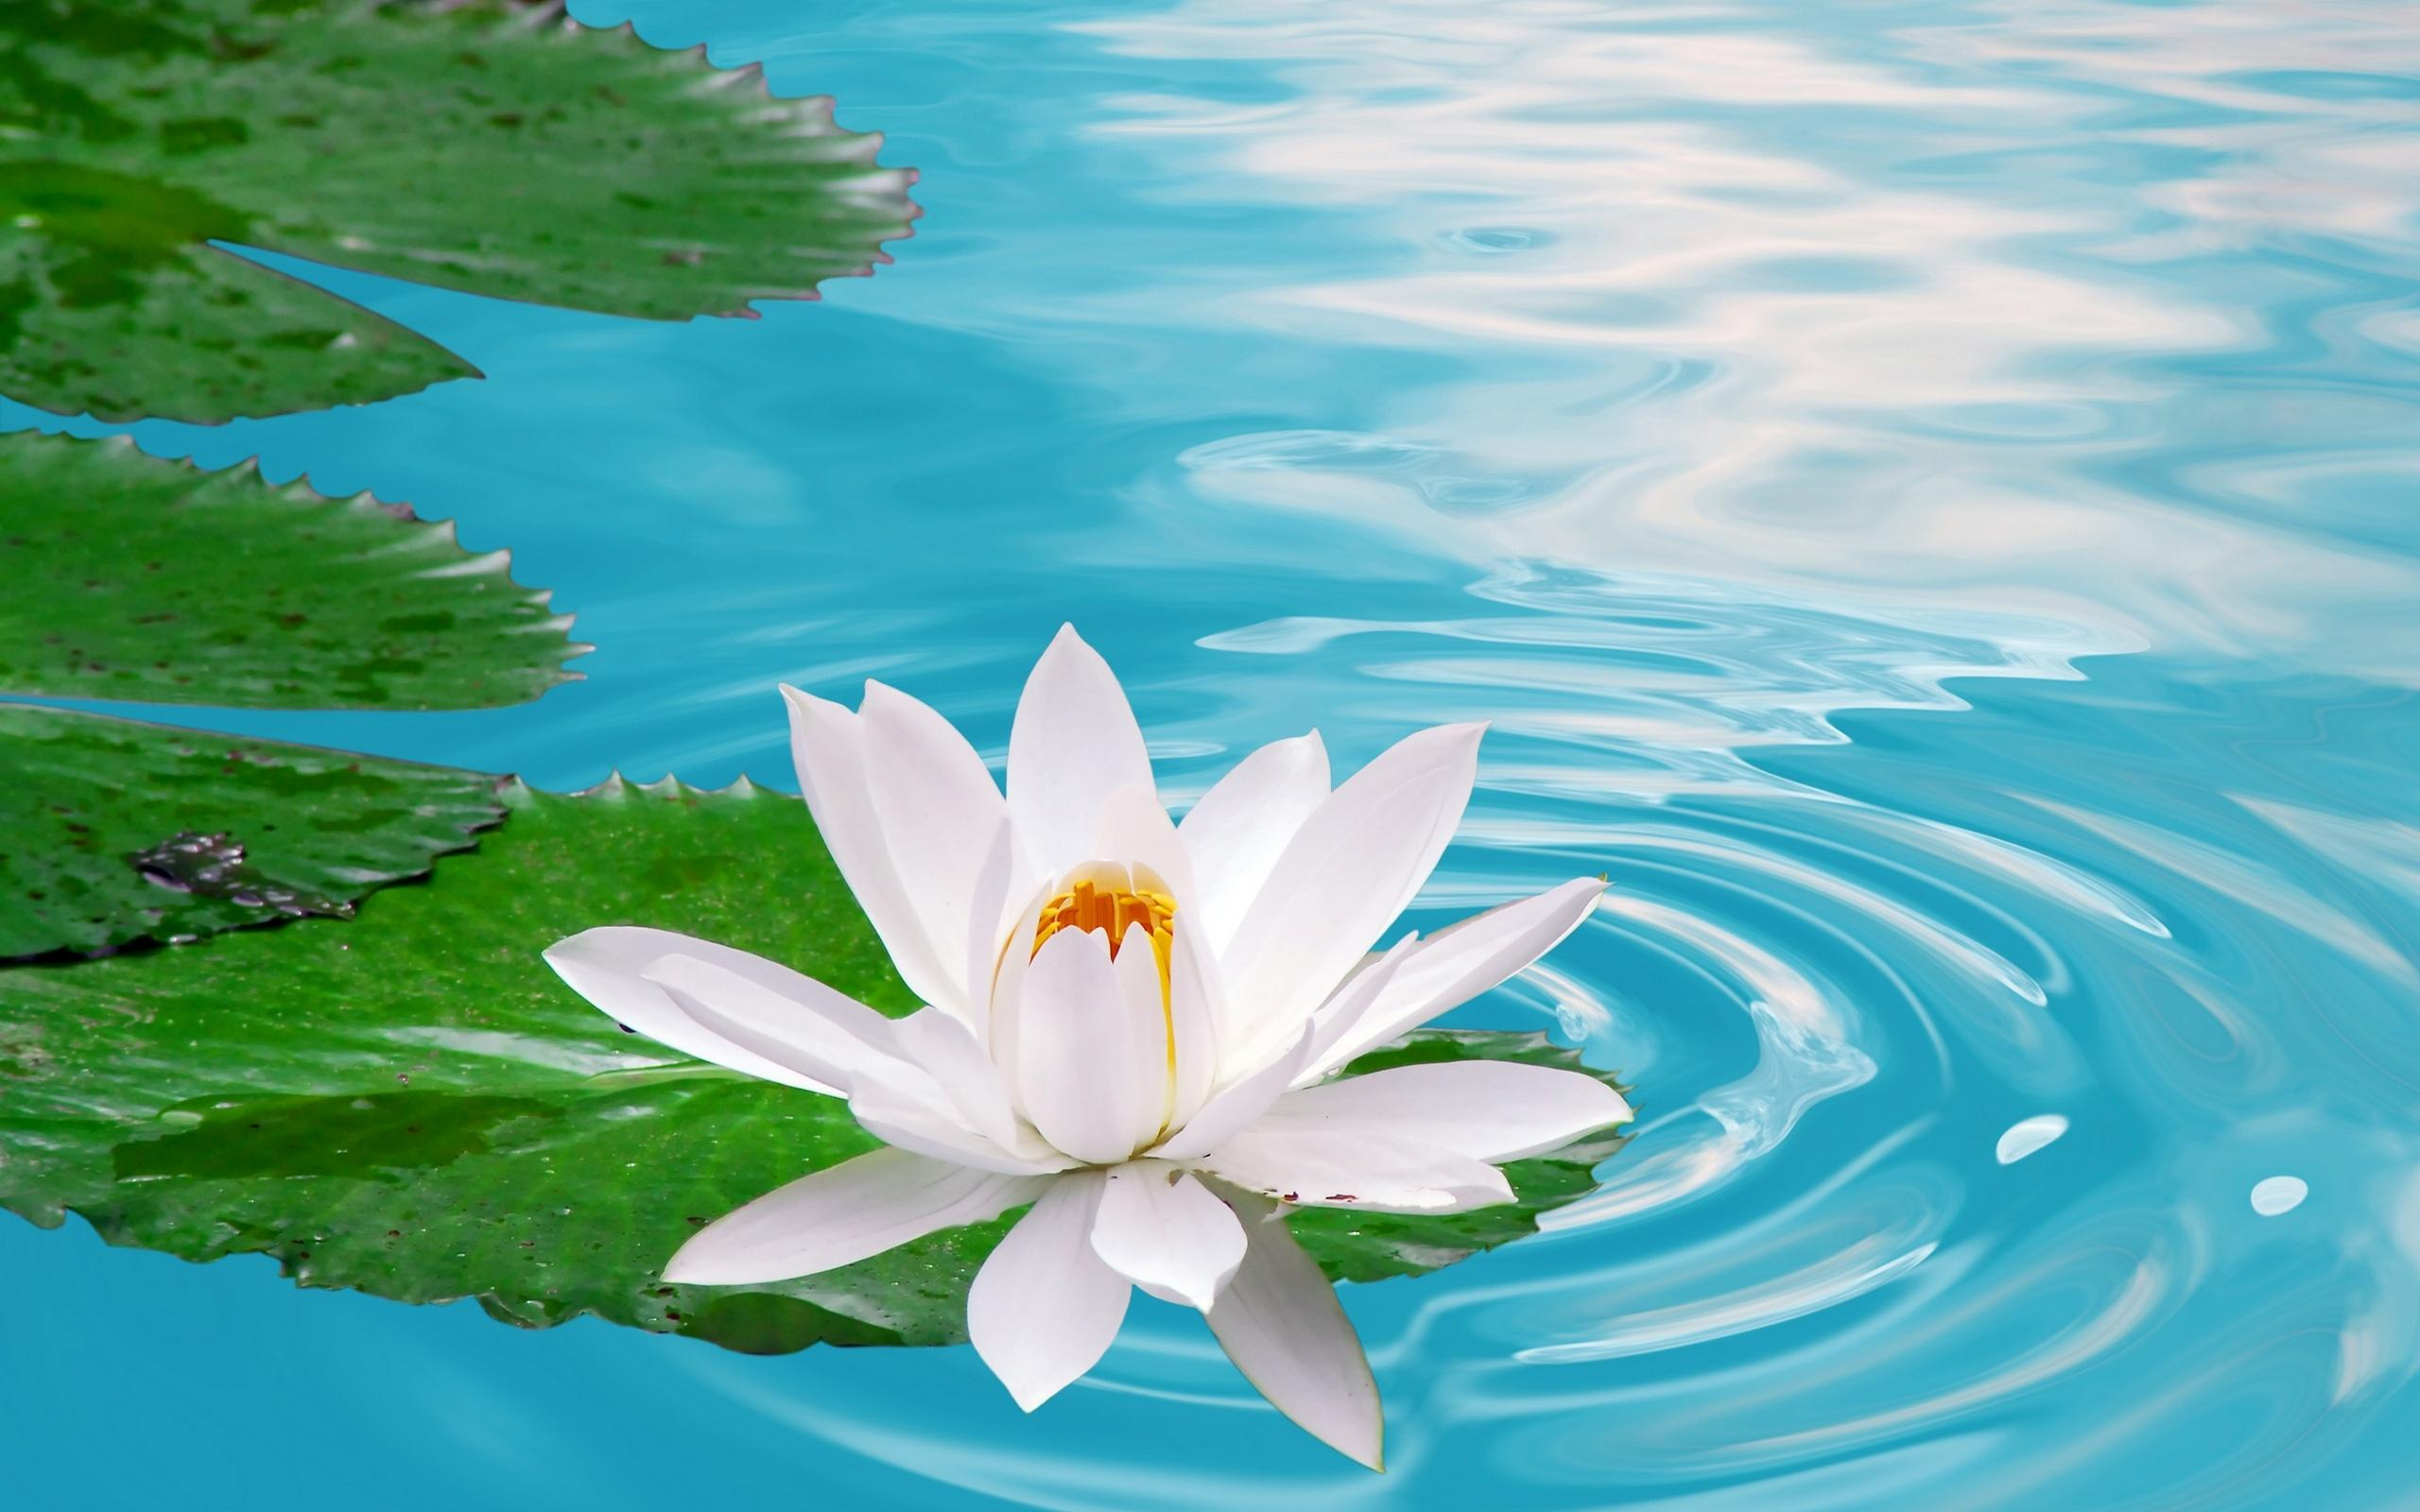 potato-high-definition-flowers-hd-n-1231546 (jpeg image, 2560